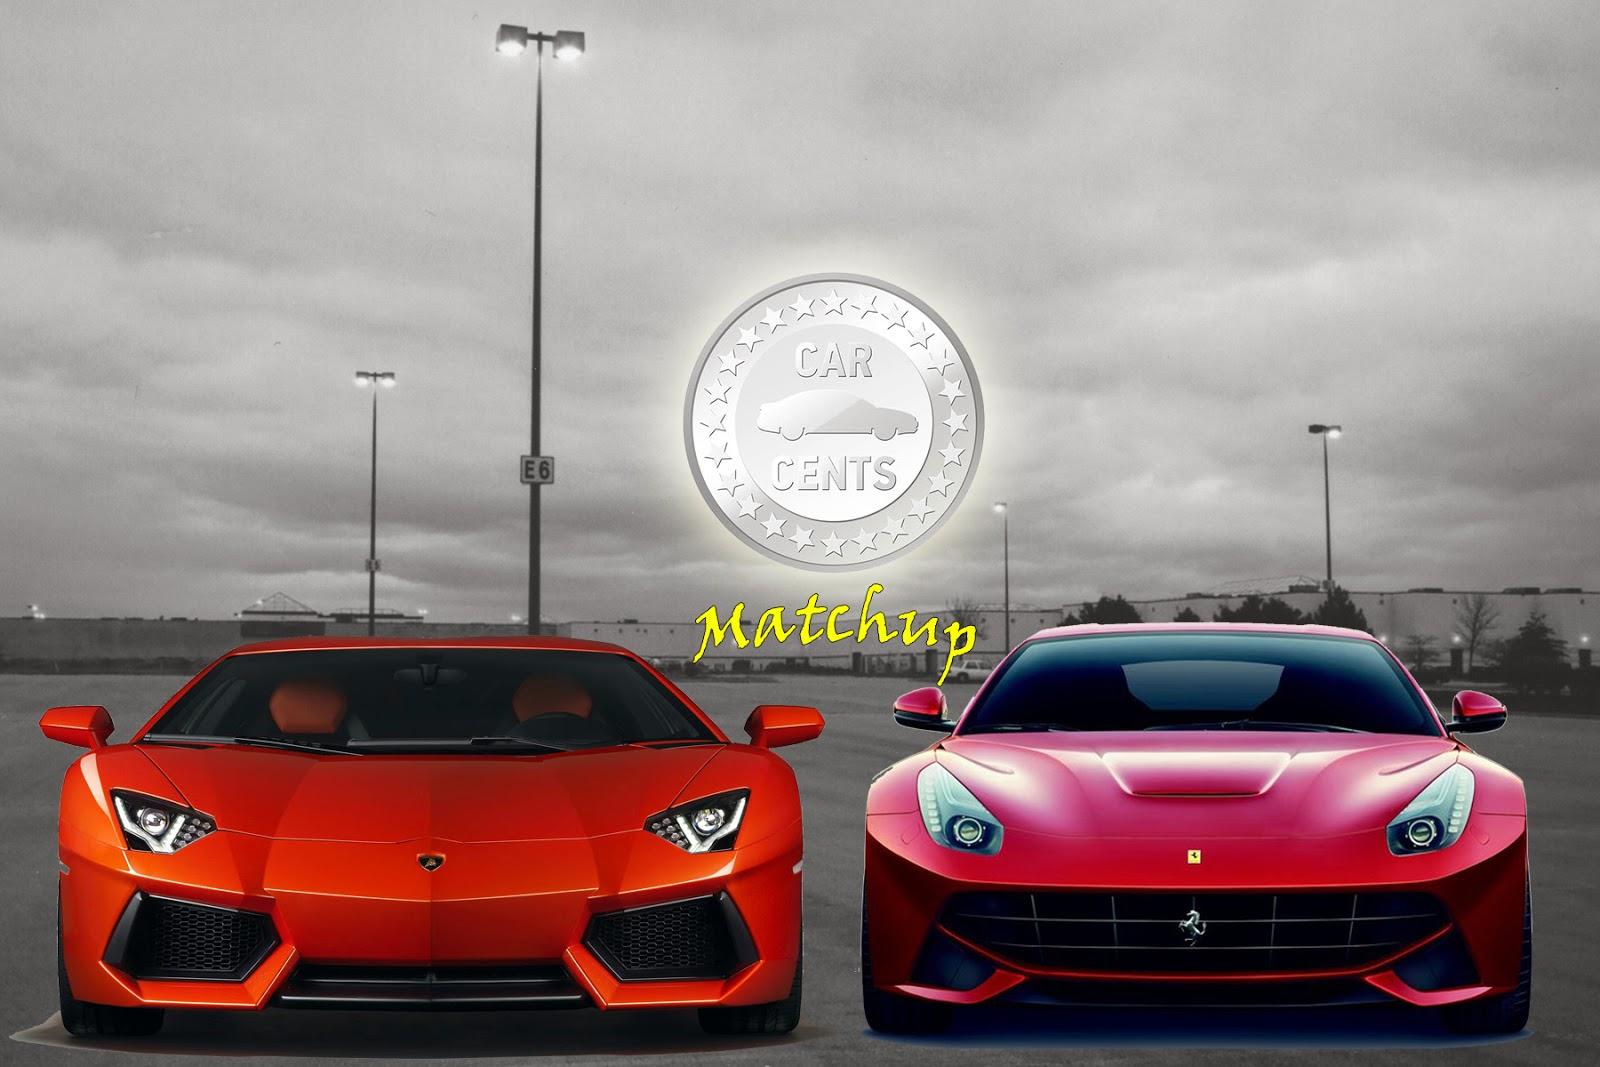 Utah Car Cents Monday Match Up Ferrari F12 Berlinetta Or The